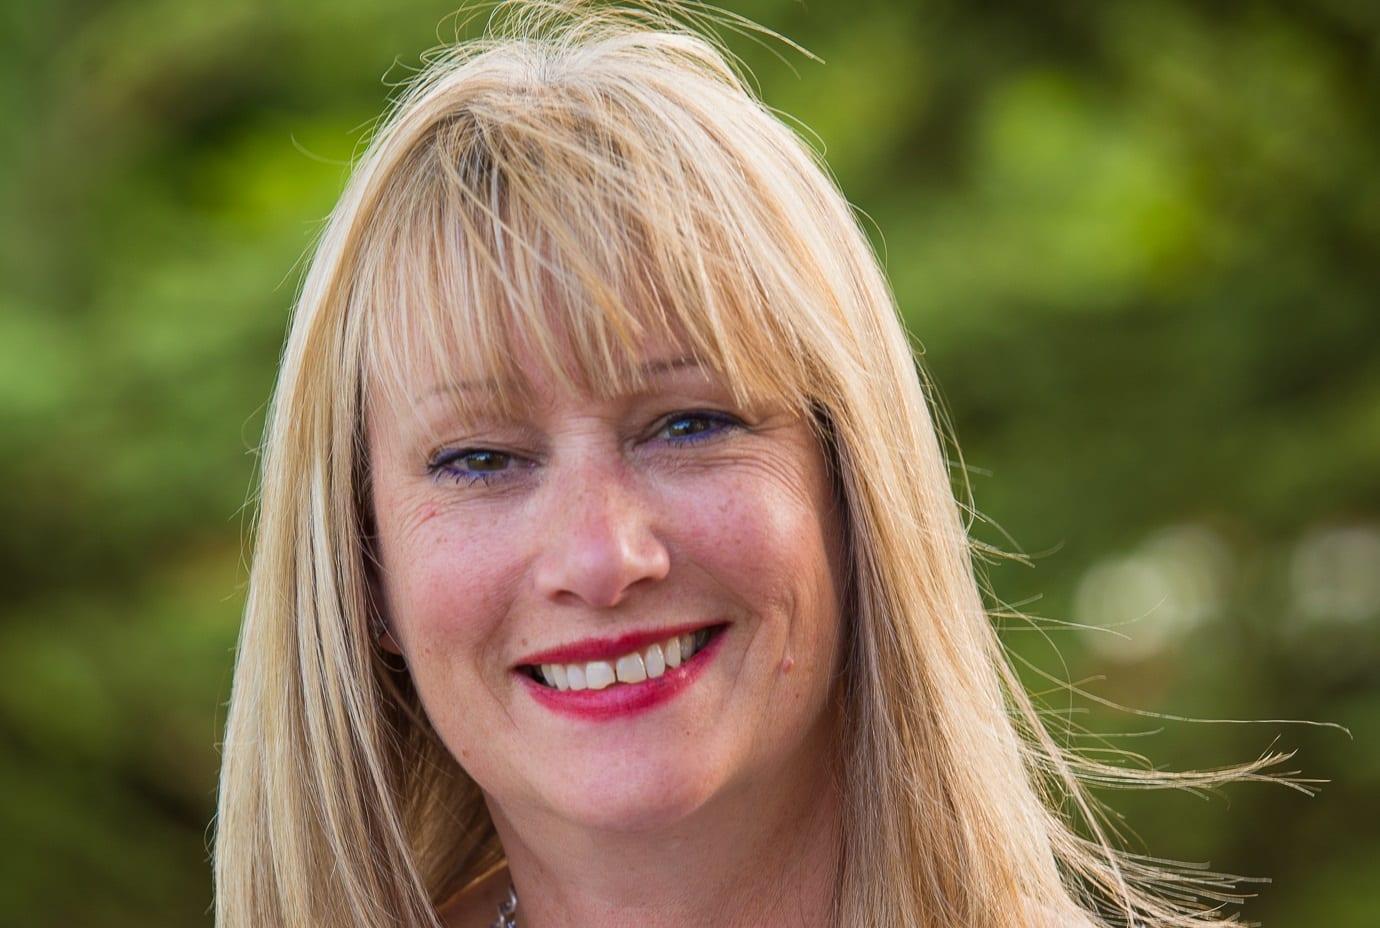 Barratt Homes to launch Charfield Gardens development - PropertyWire